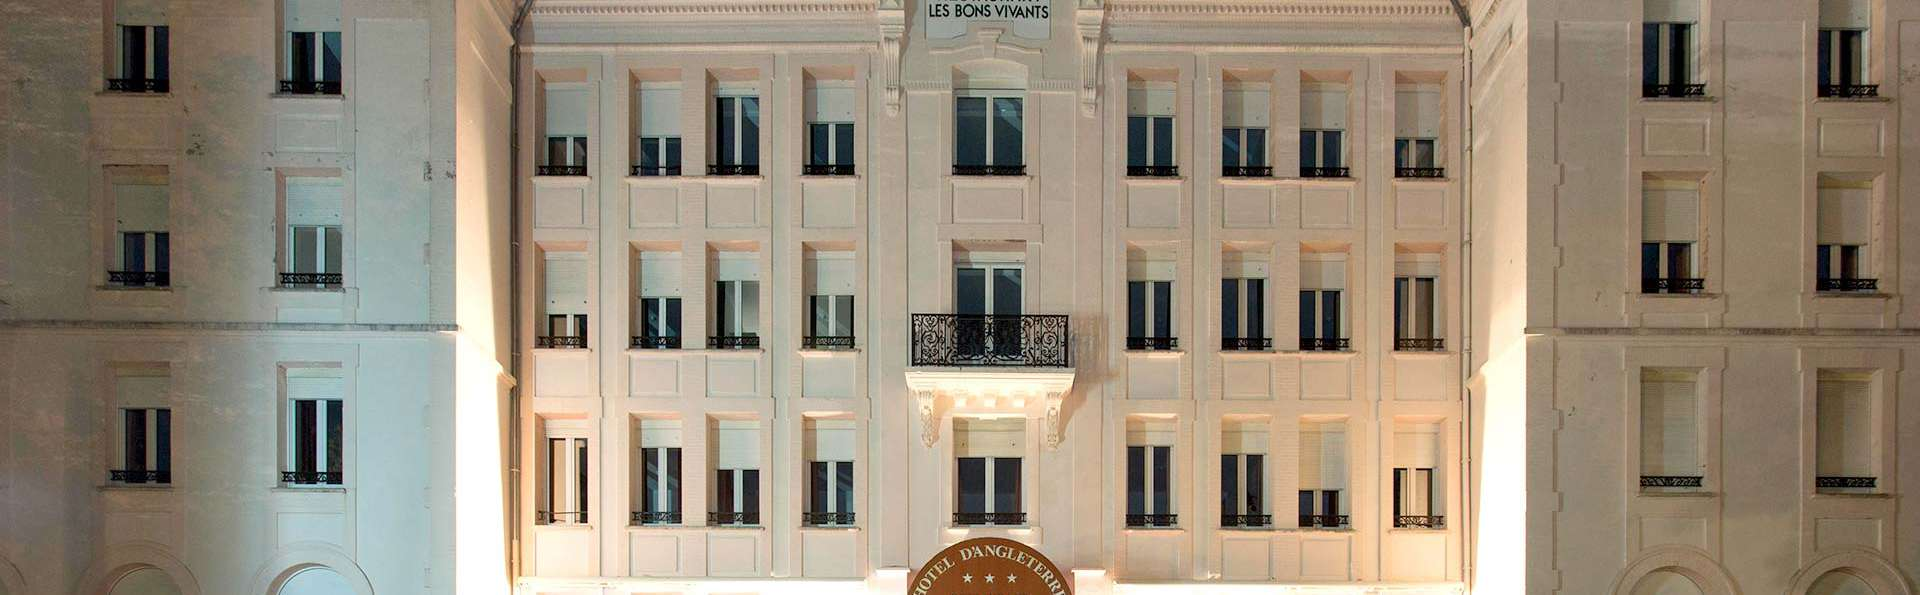 Hôtel d'Angleterre - Vittel - EDIT_NEW_FRONT.jpg